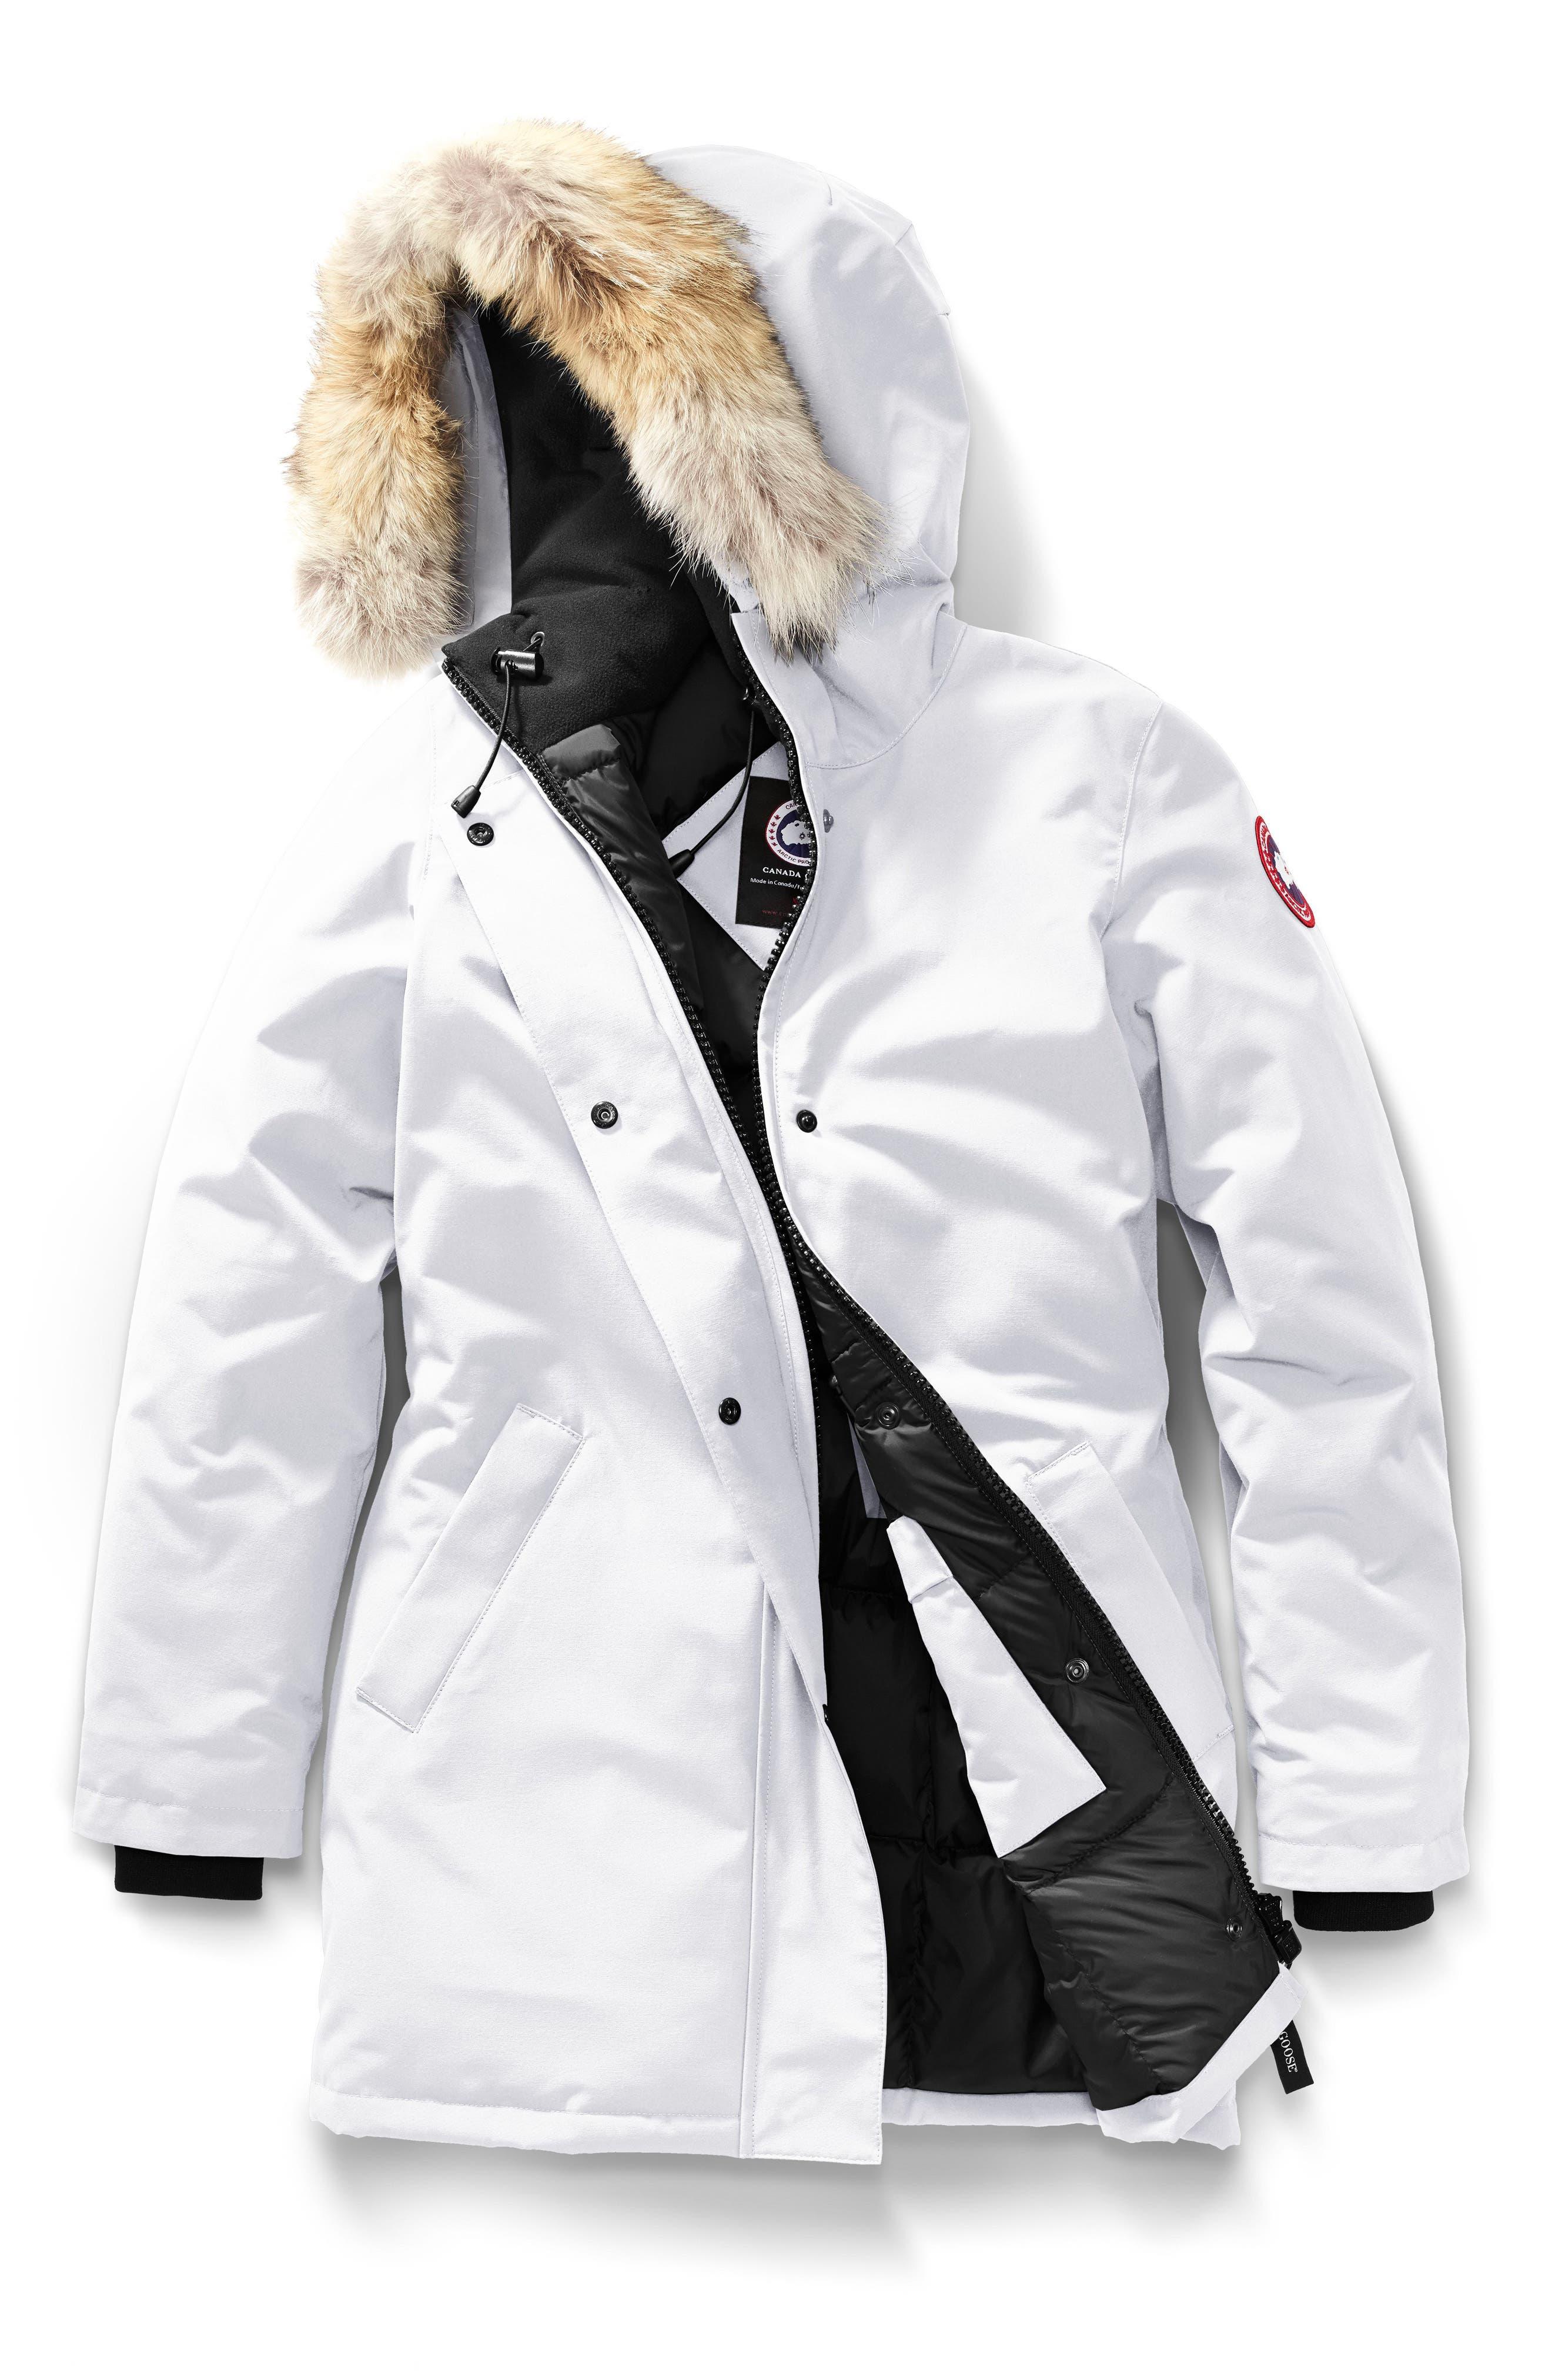 Canada Goose Victoria Down Parka With Genuine Coyote Fur Trim, (6-8) - White